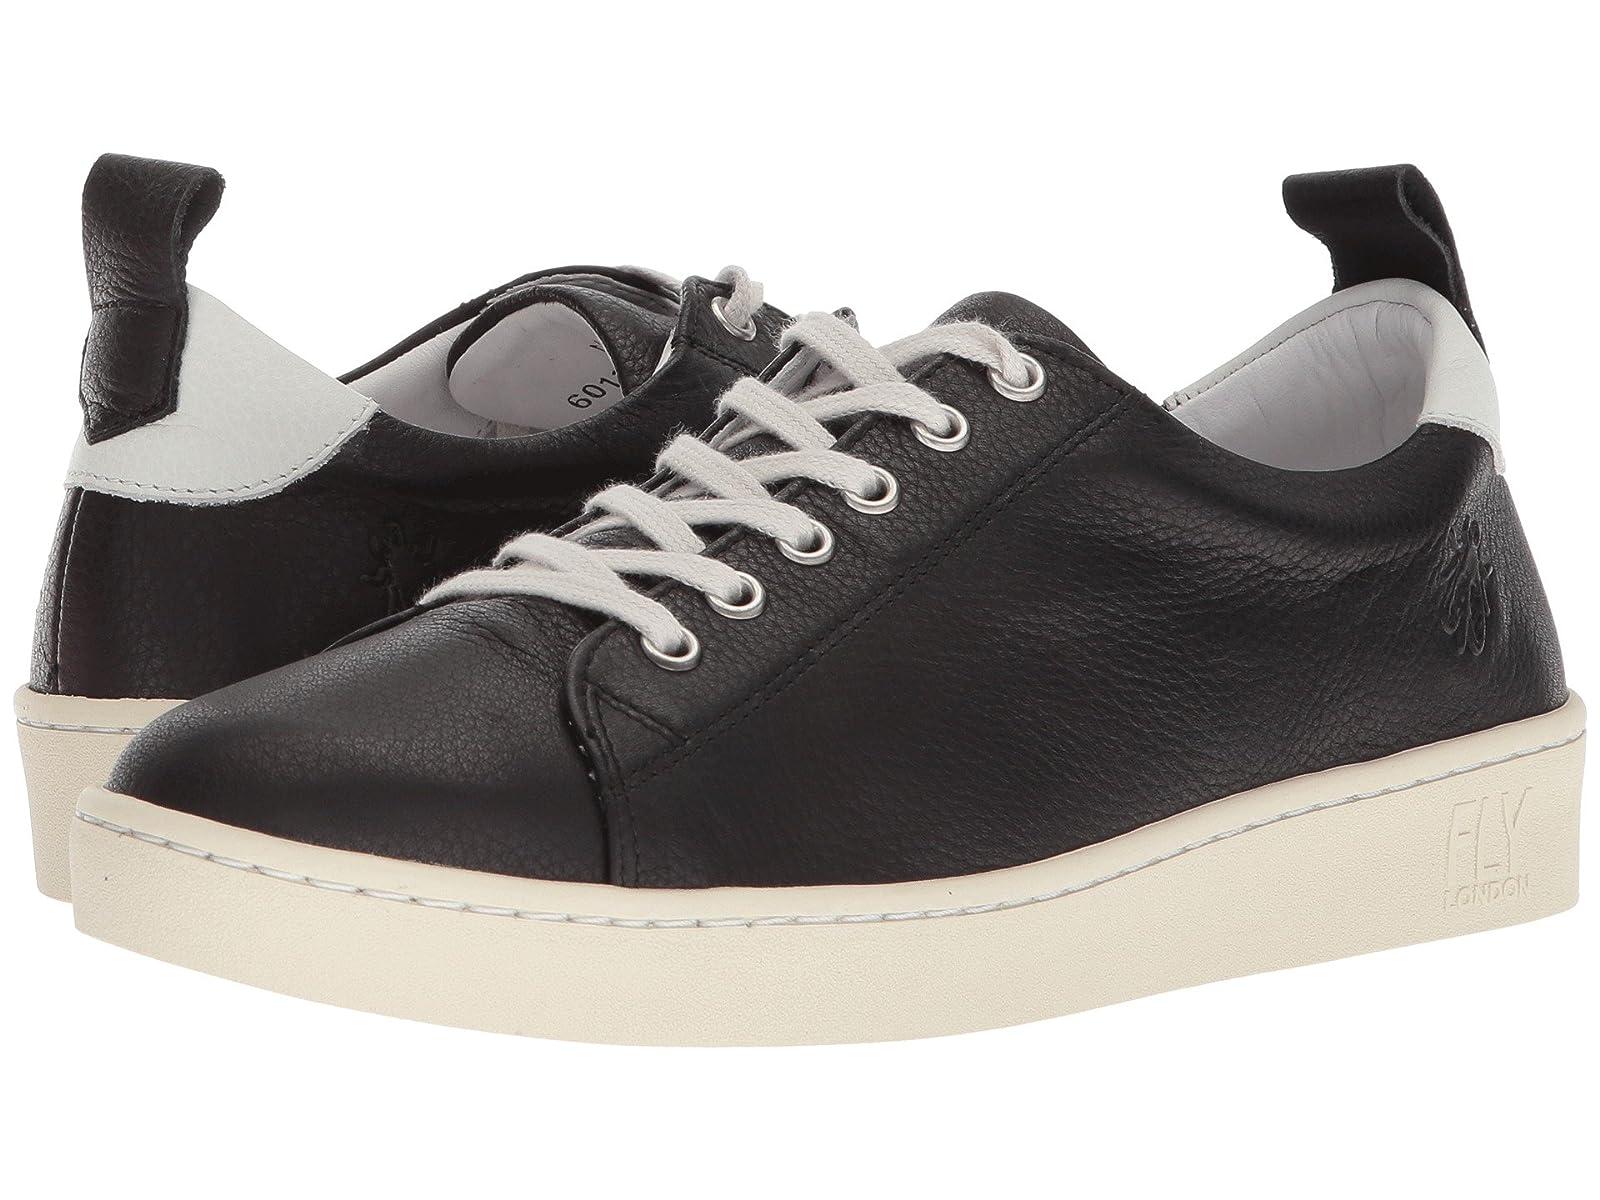 FLY LONDON MAKU310FLYCheap and distinctive eye-catching shoes